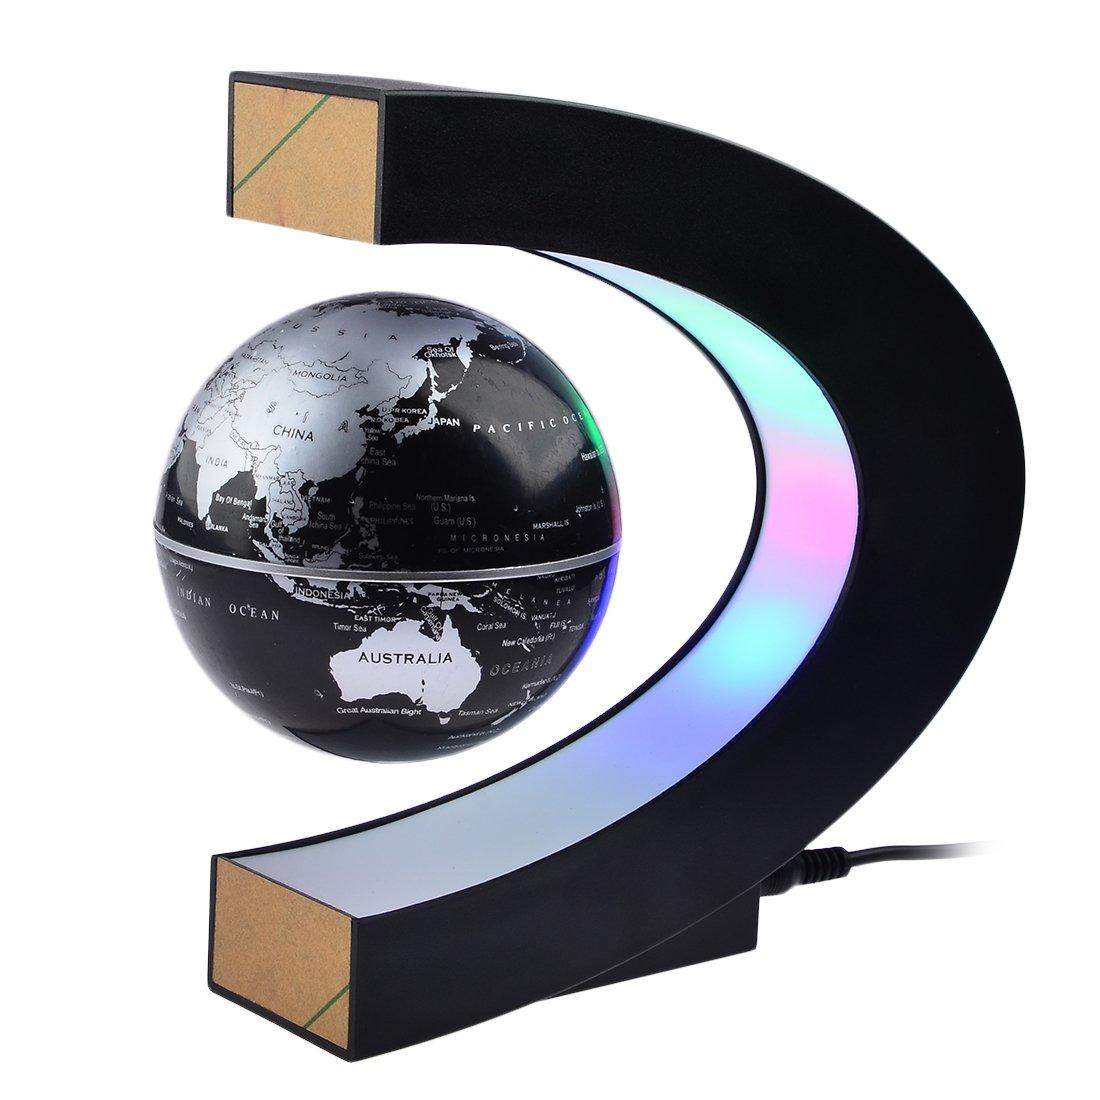 Petforu Magnetic Levitation, High Rotation C Shape Magnetic Suspension Maglev Levitation Globe with LED Lights for Learning Education Teaching Demo Home Office Desk Decoration(US Plug) - Black by Petforu